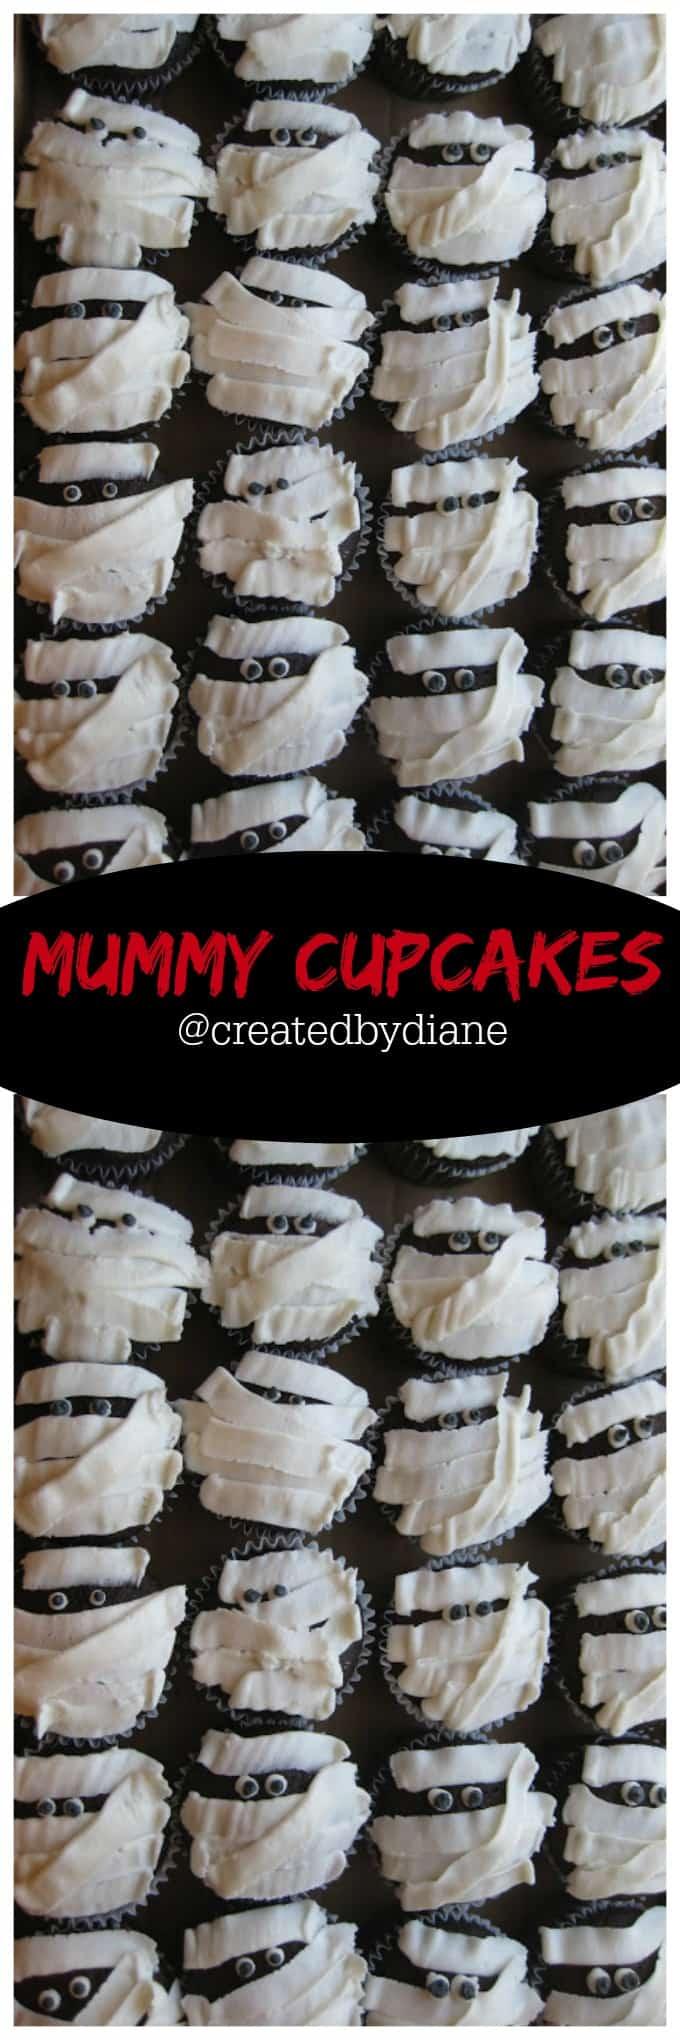 mummy cupcakes for Halloween @createdbydiane